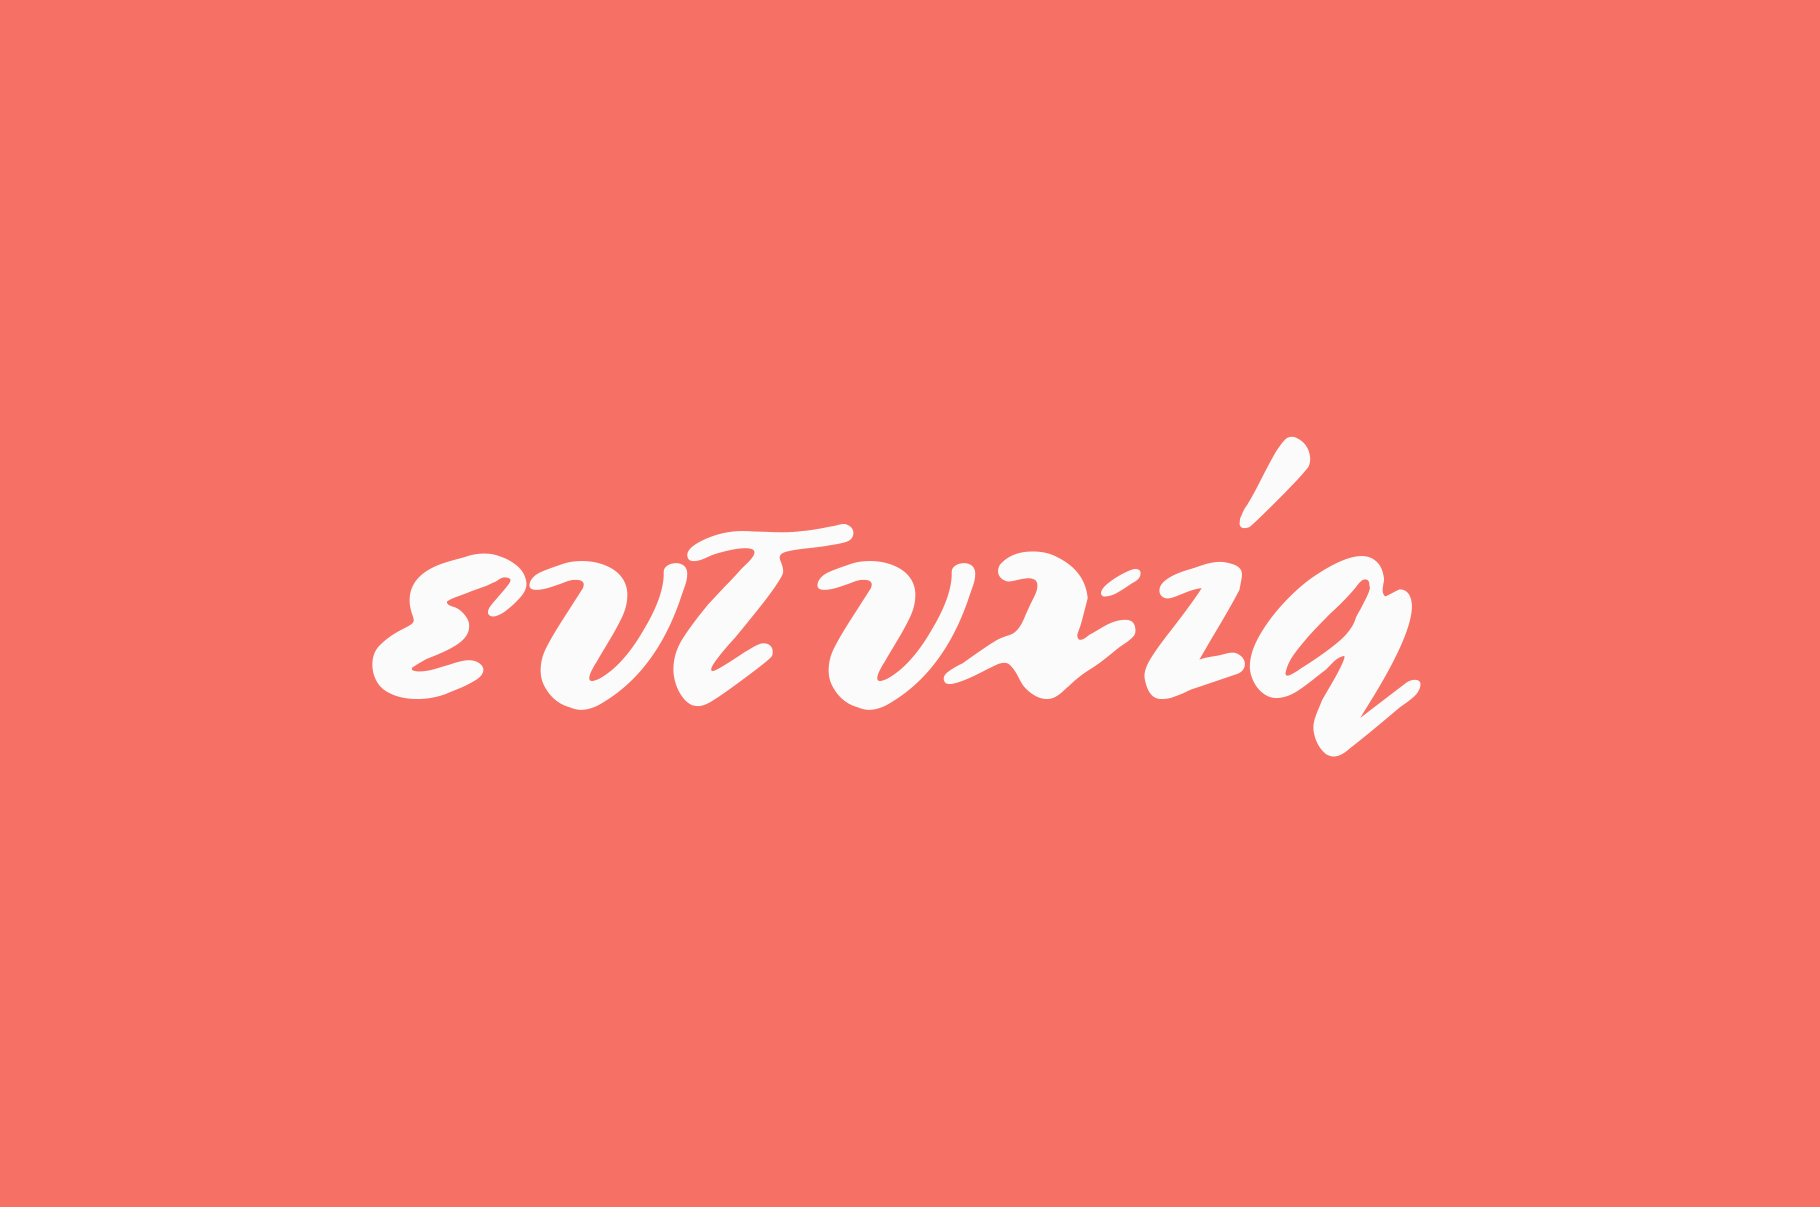 Multilingual Brush Font- Naquia Font example image 10